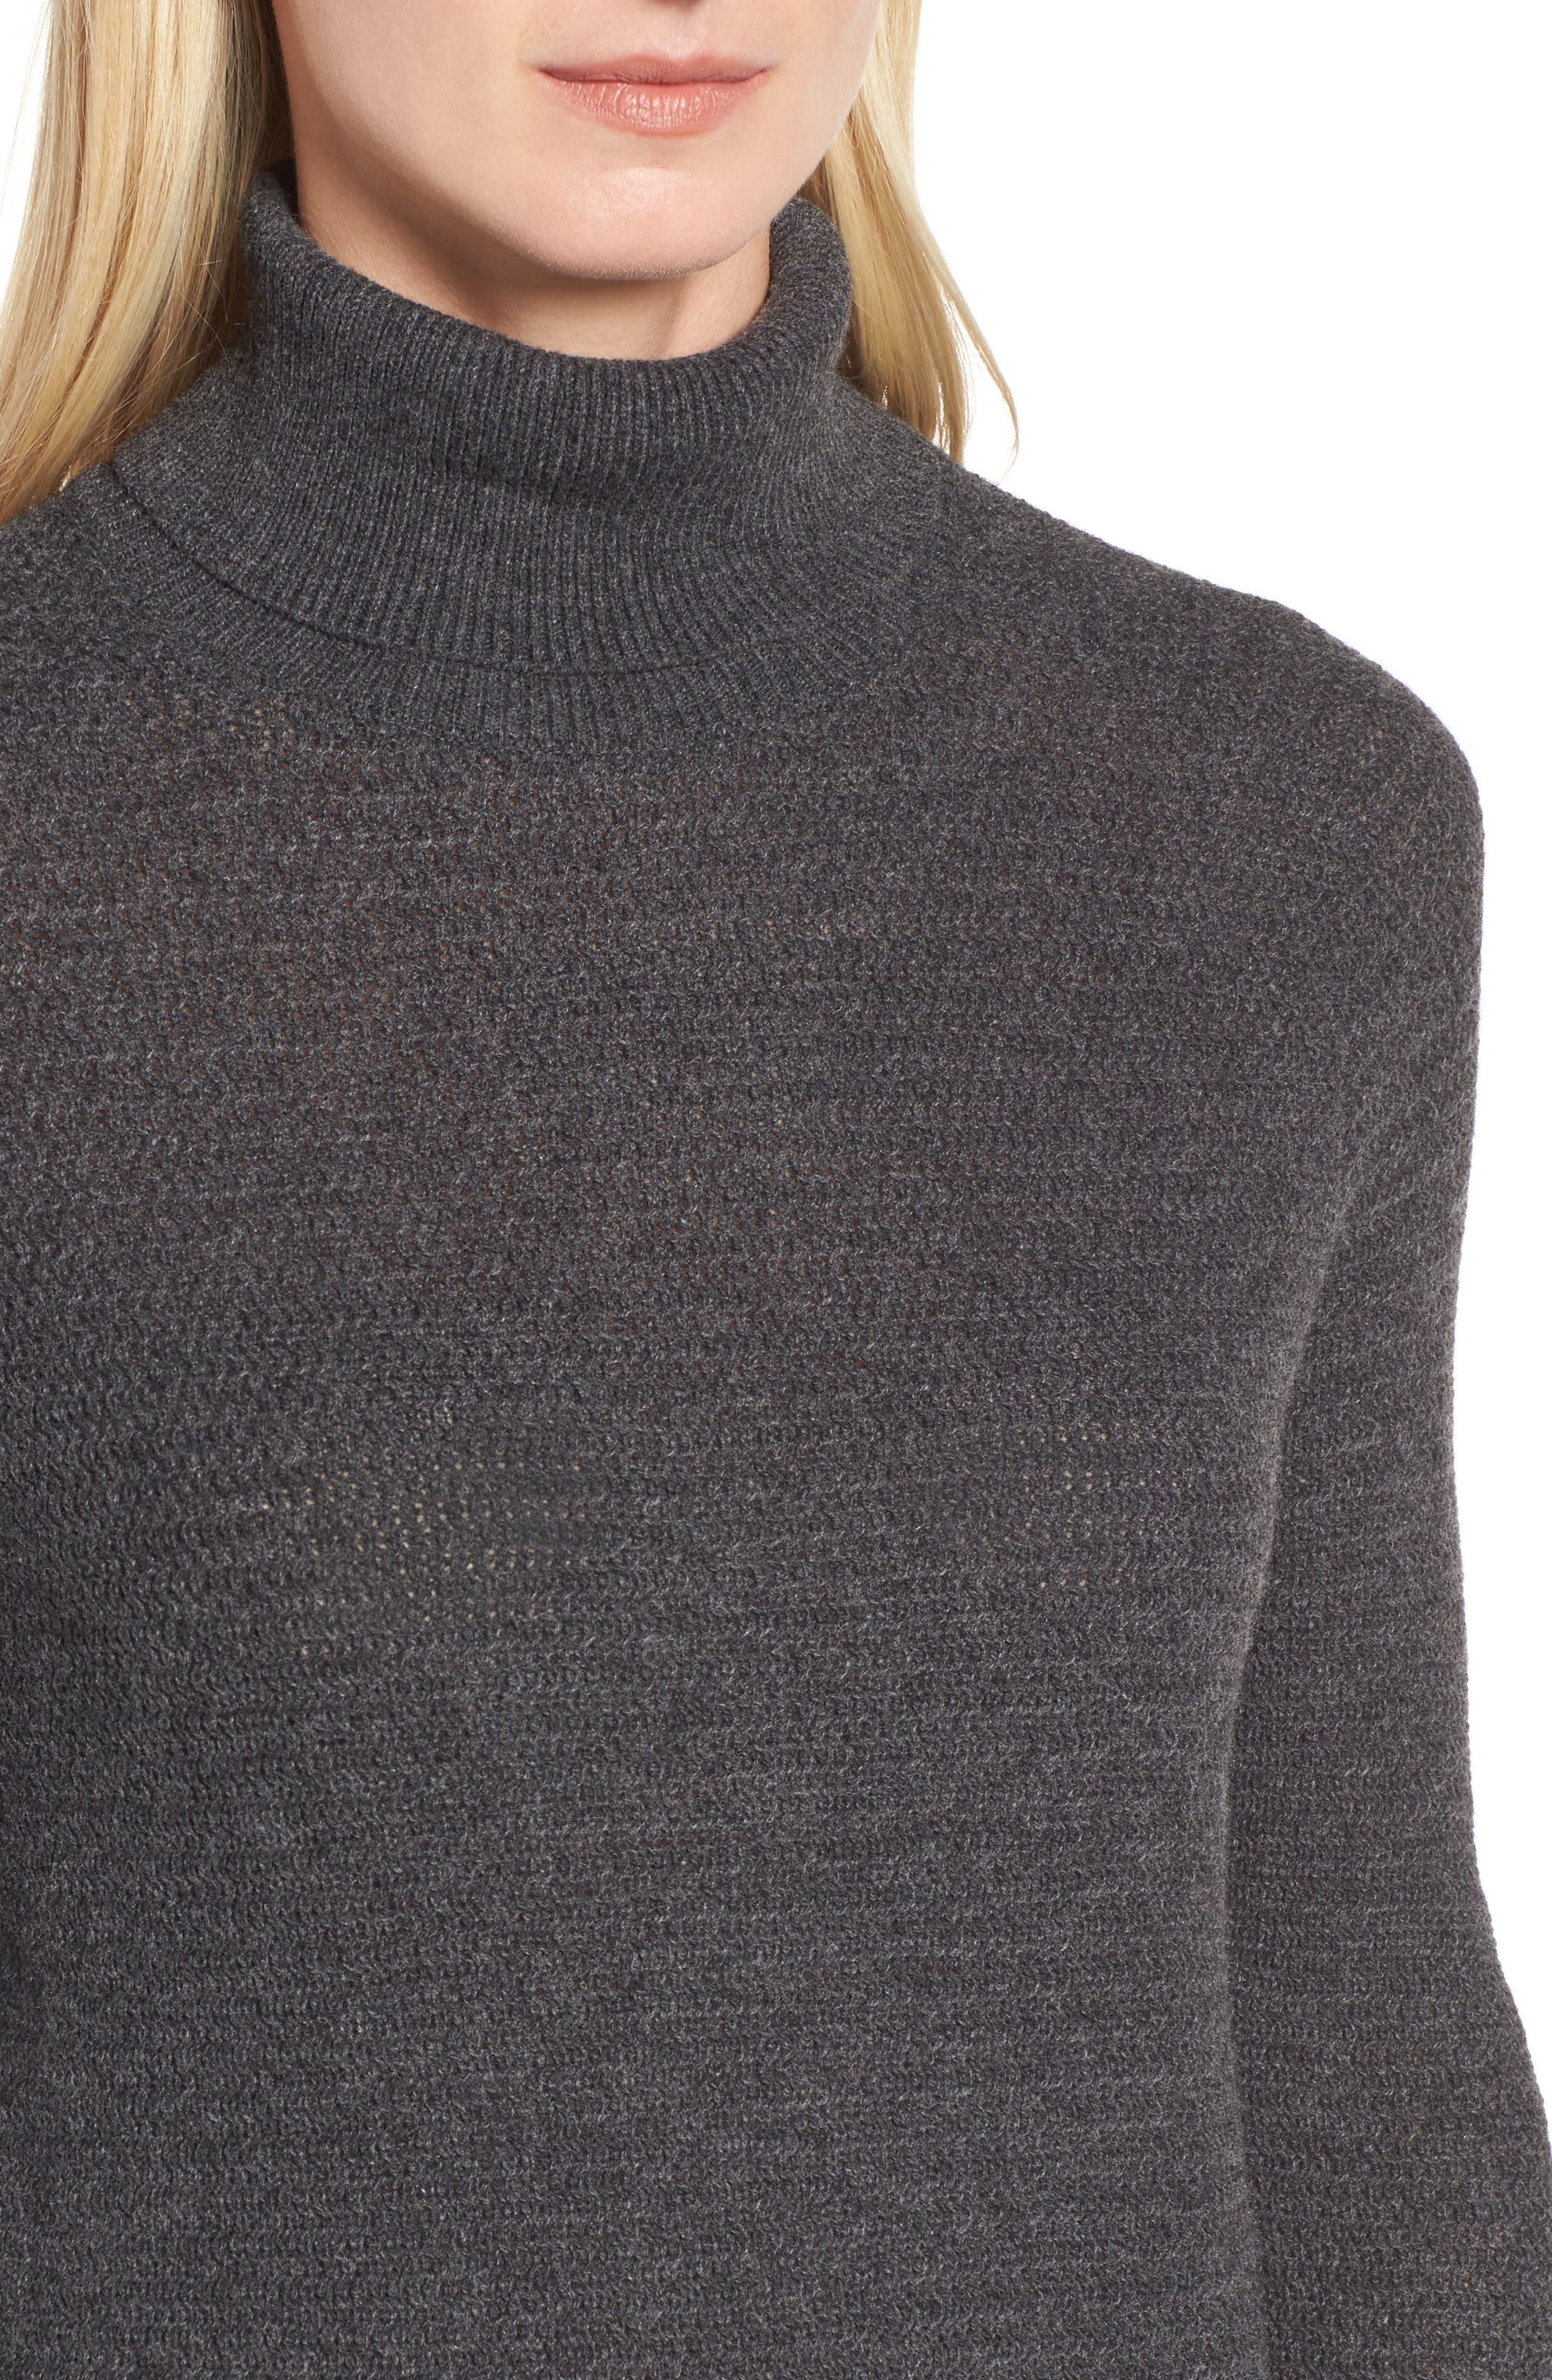 Turtleneck Tunic Sweater,                             Alternate thumbnail 4, color,                             021